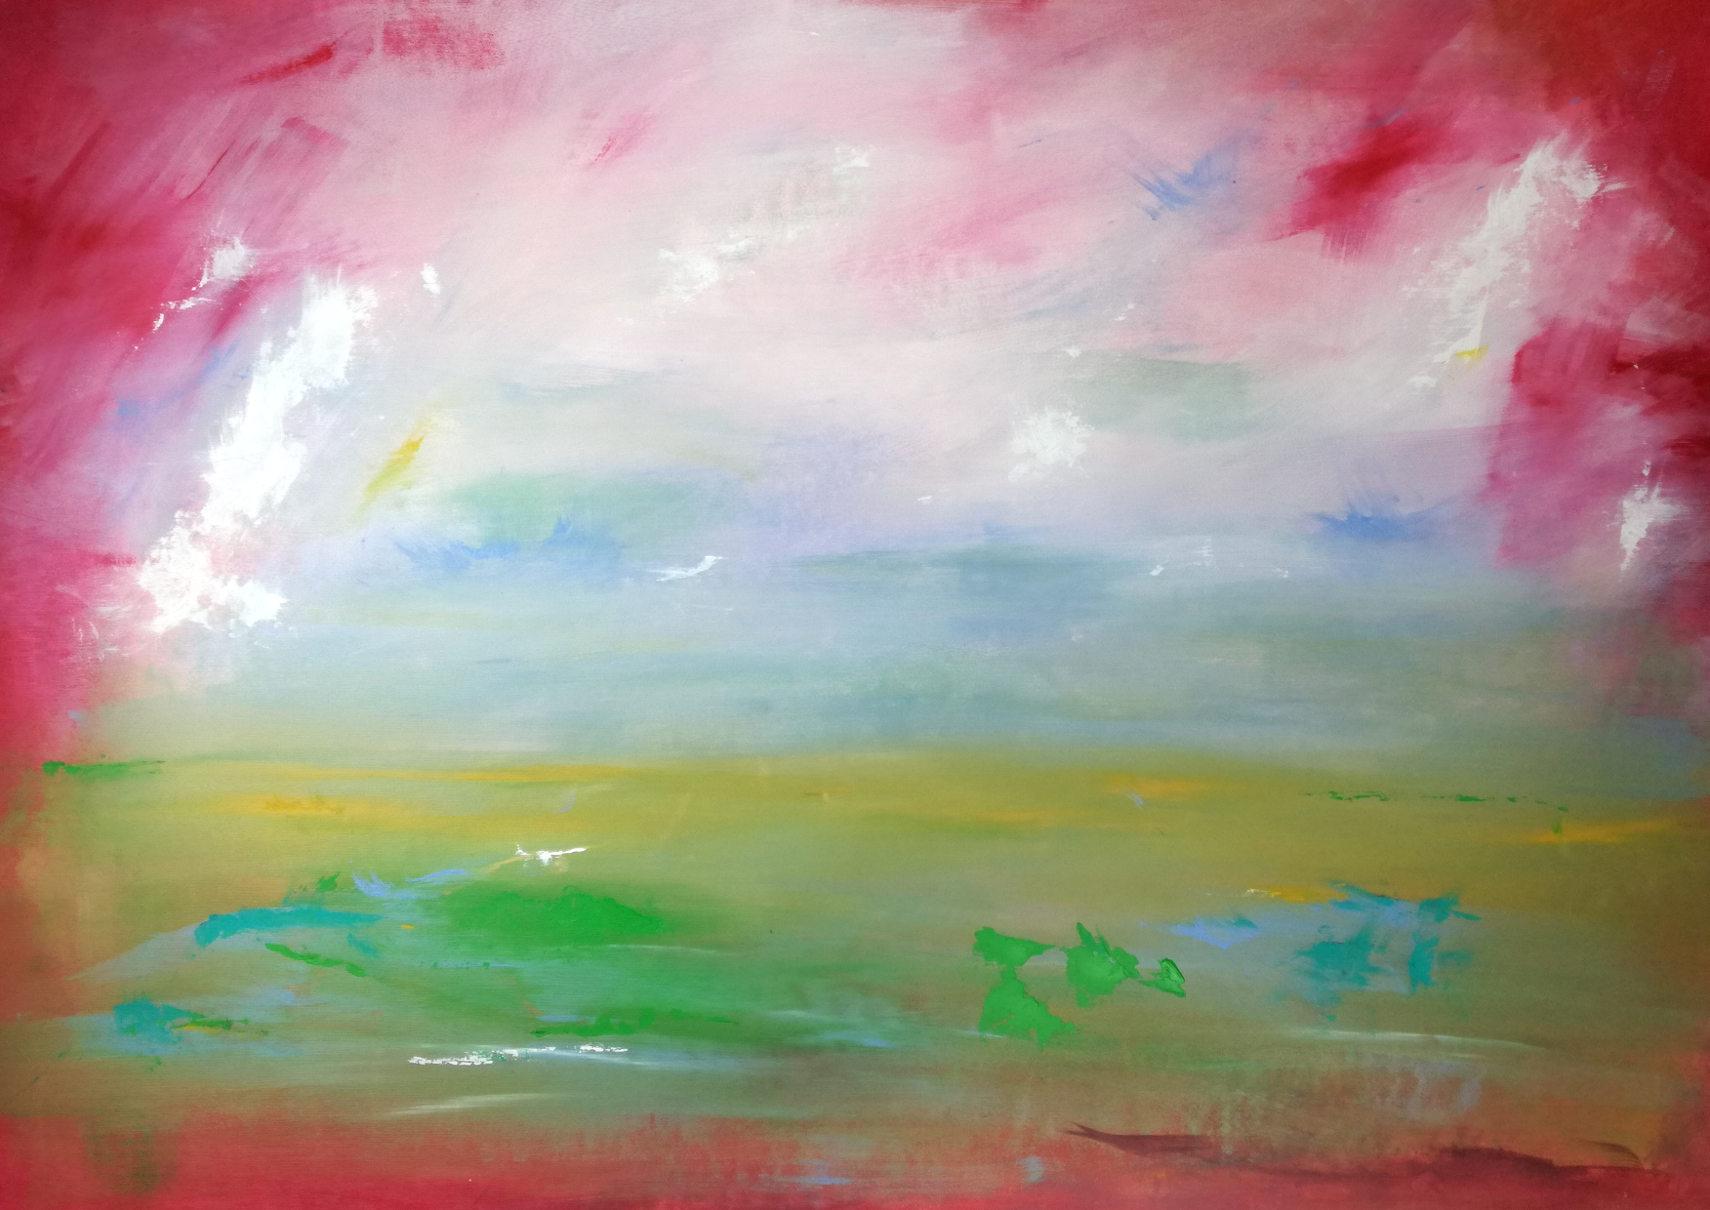 paesaggio rosso c142 - dipinti-moderni-paesaggi-100x70 rosso